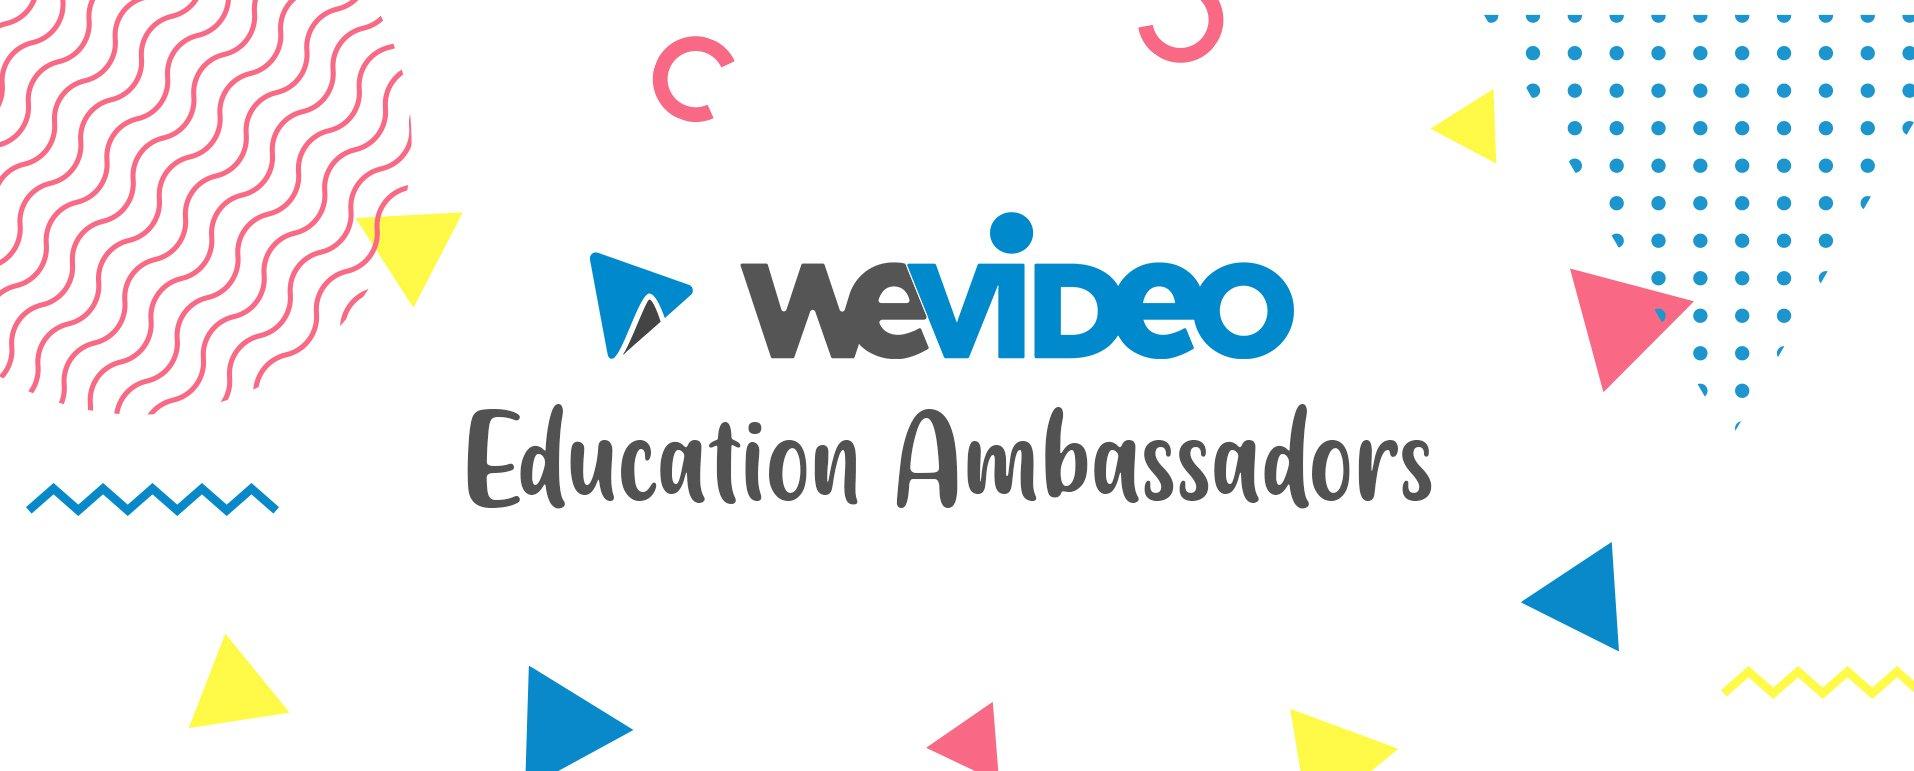 EDU_Ambassadors_hero